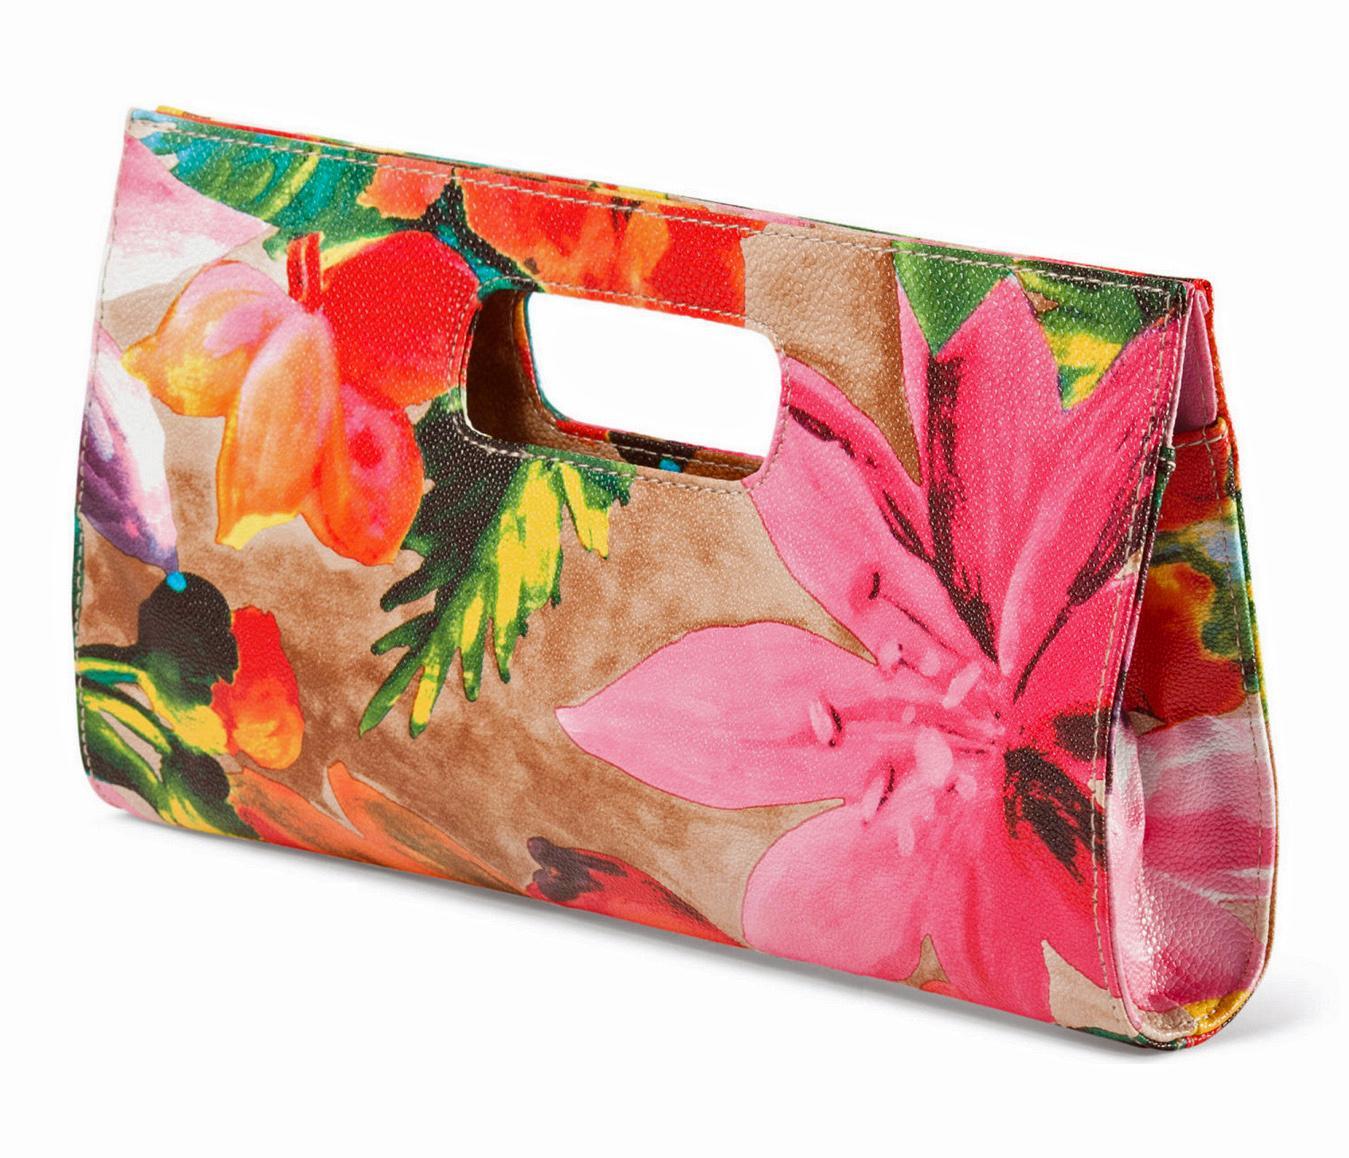 Chateau Tropical Floral Print Vegan Leather Clutch Bag